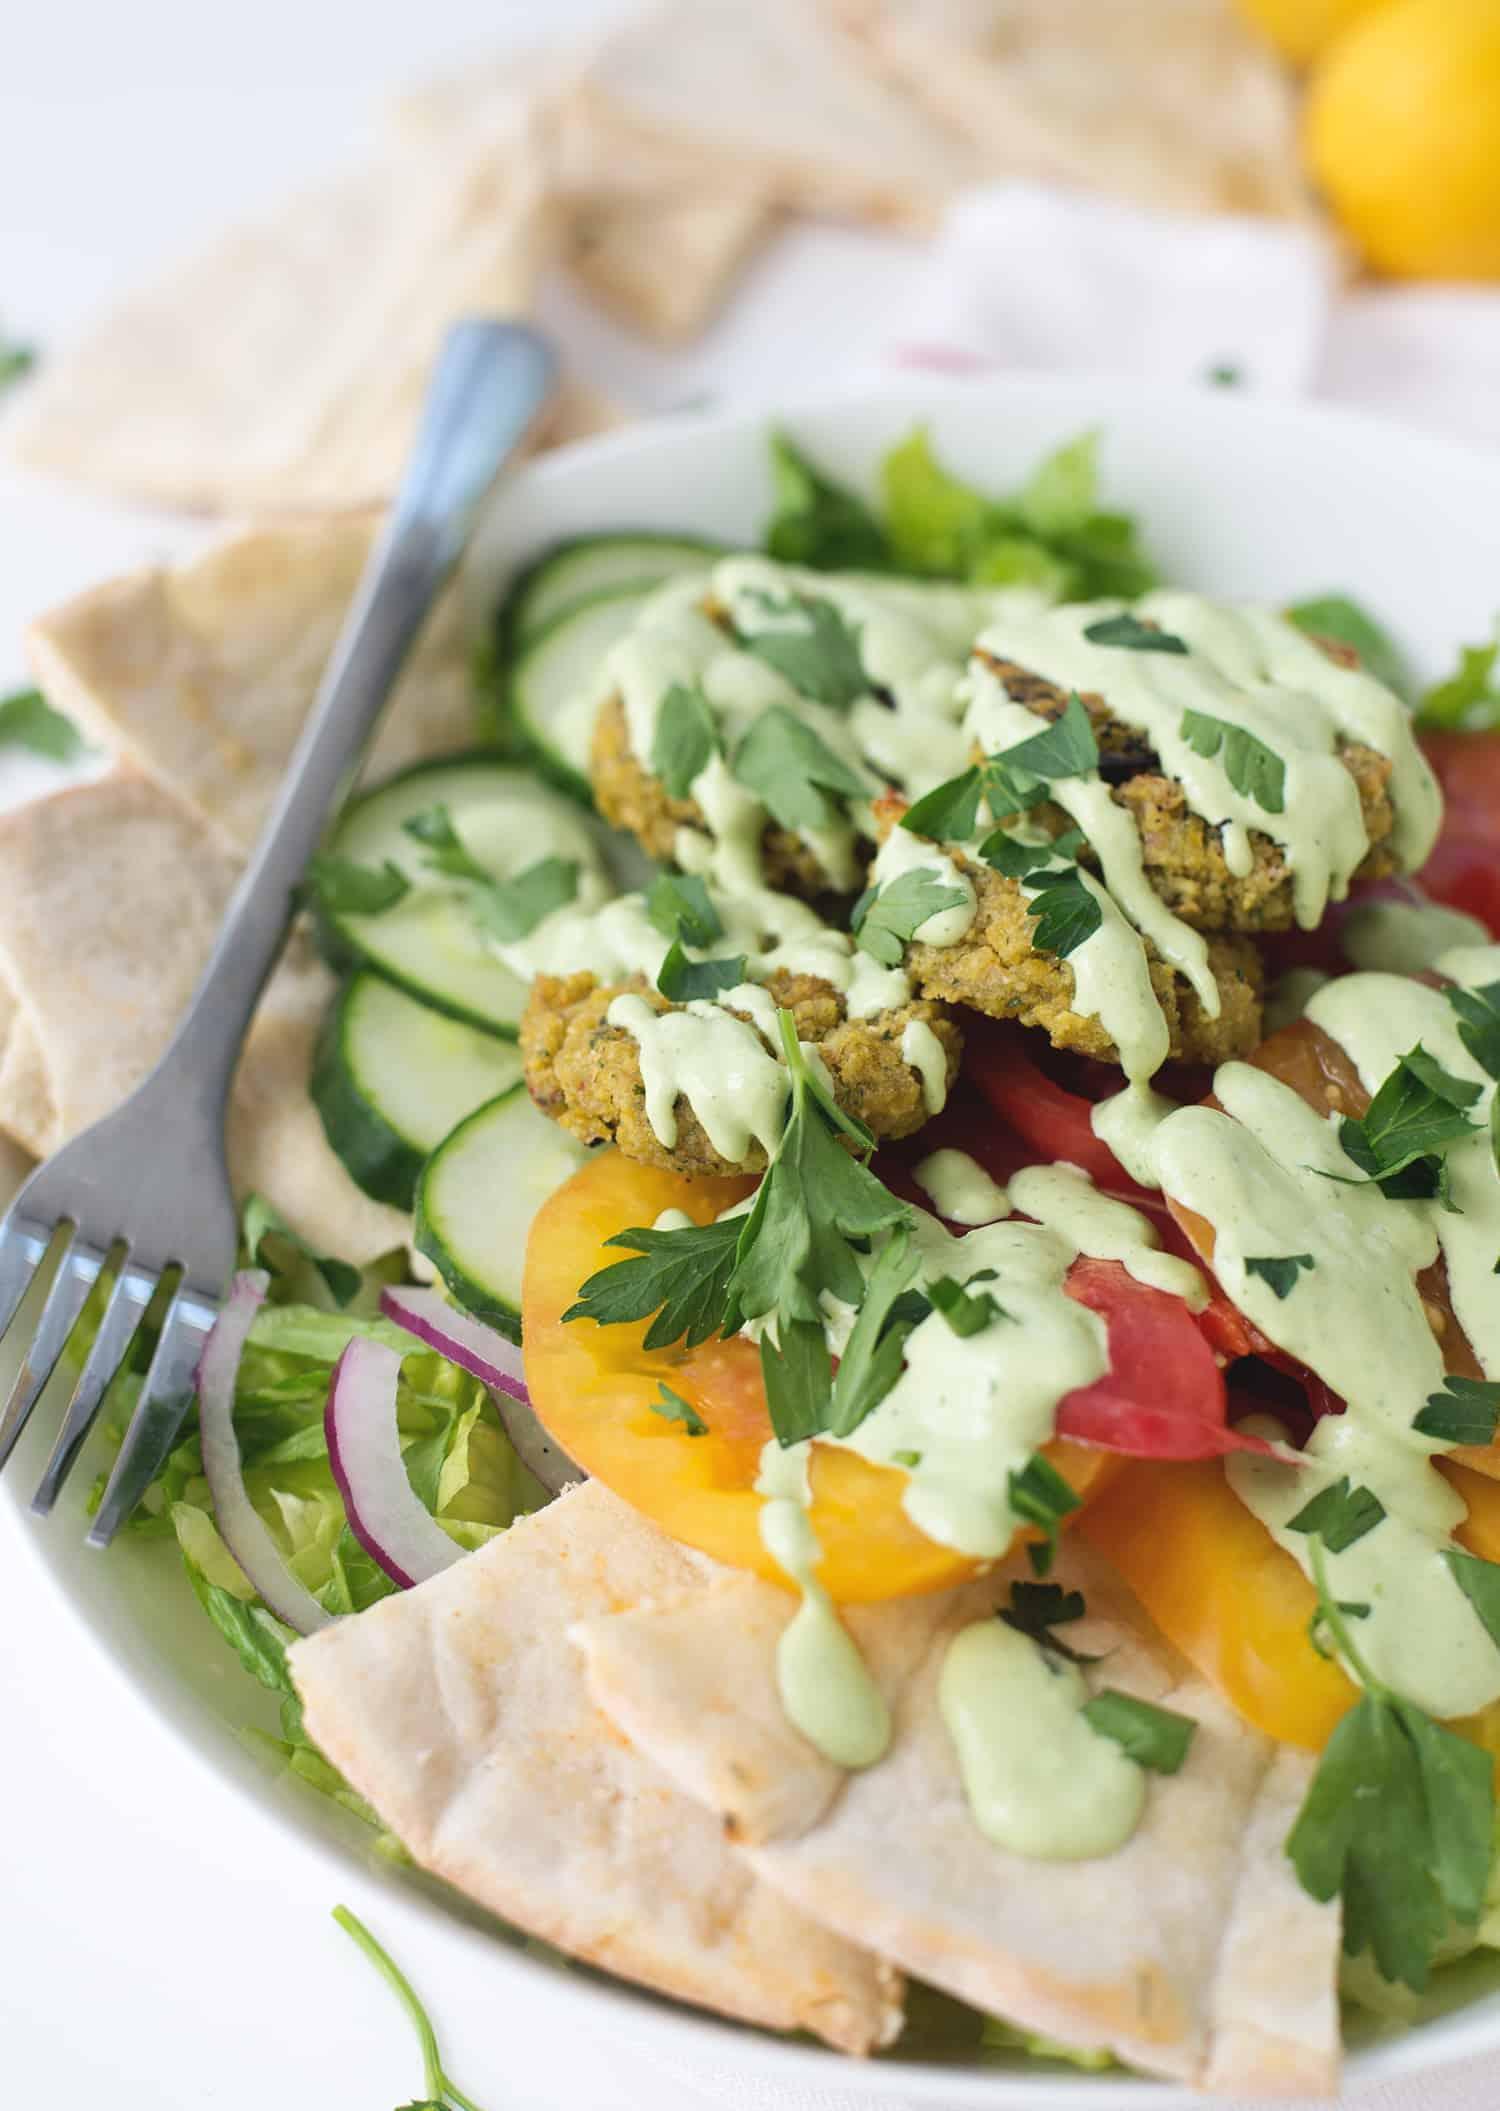 Falafel Salad with Tahini Parsley dressing! Crispy vegan falafel patties on top of salad with tahini parsley dressing. | www.delishknowledge.com